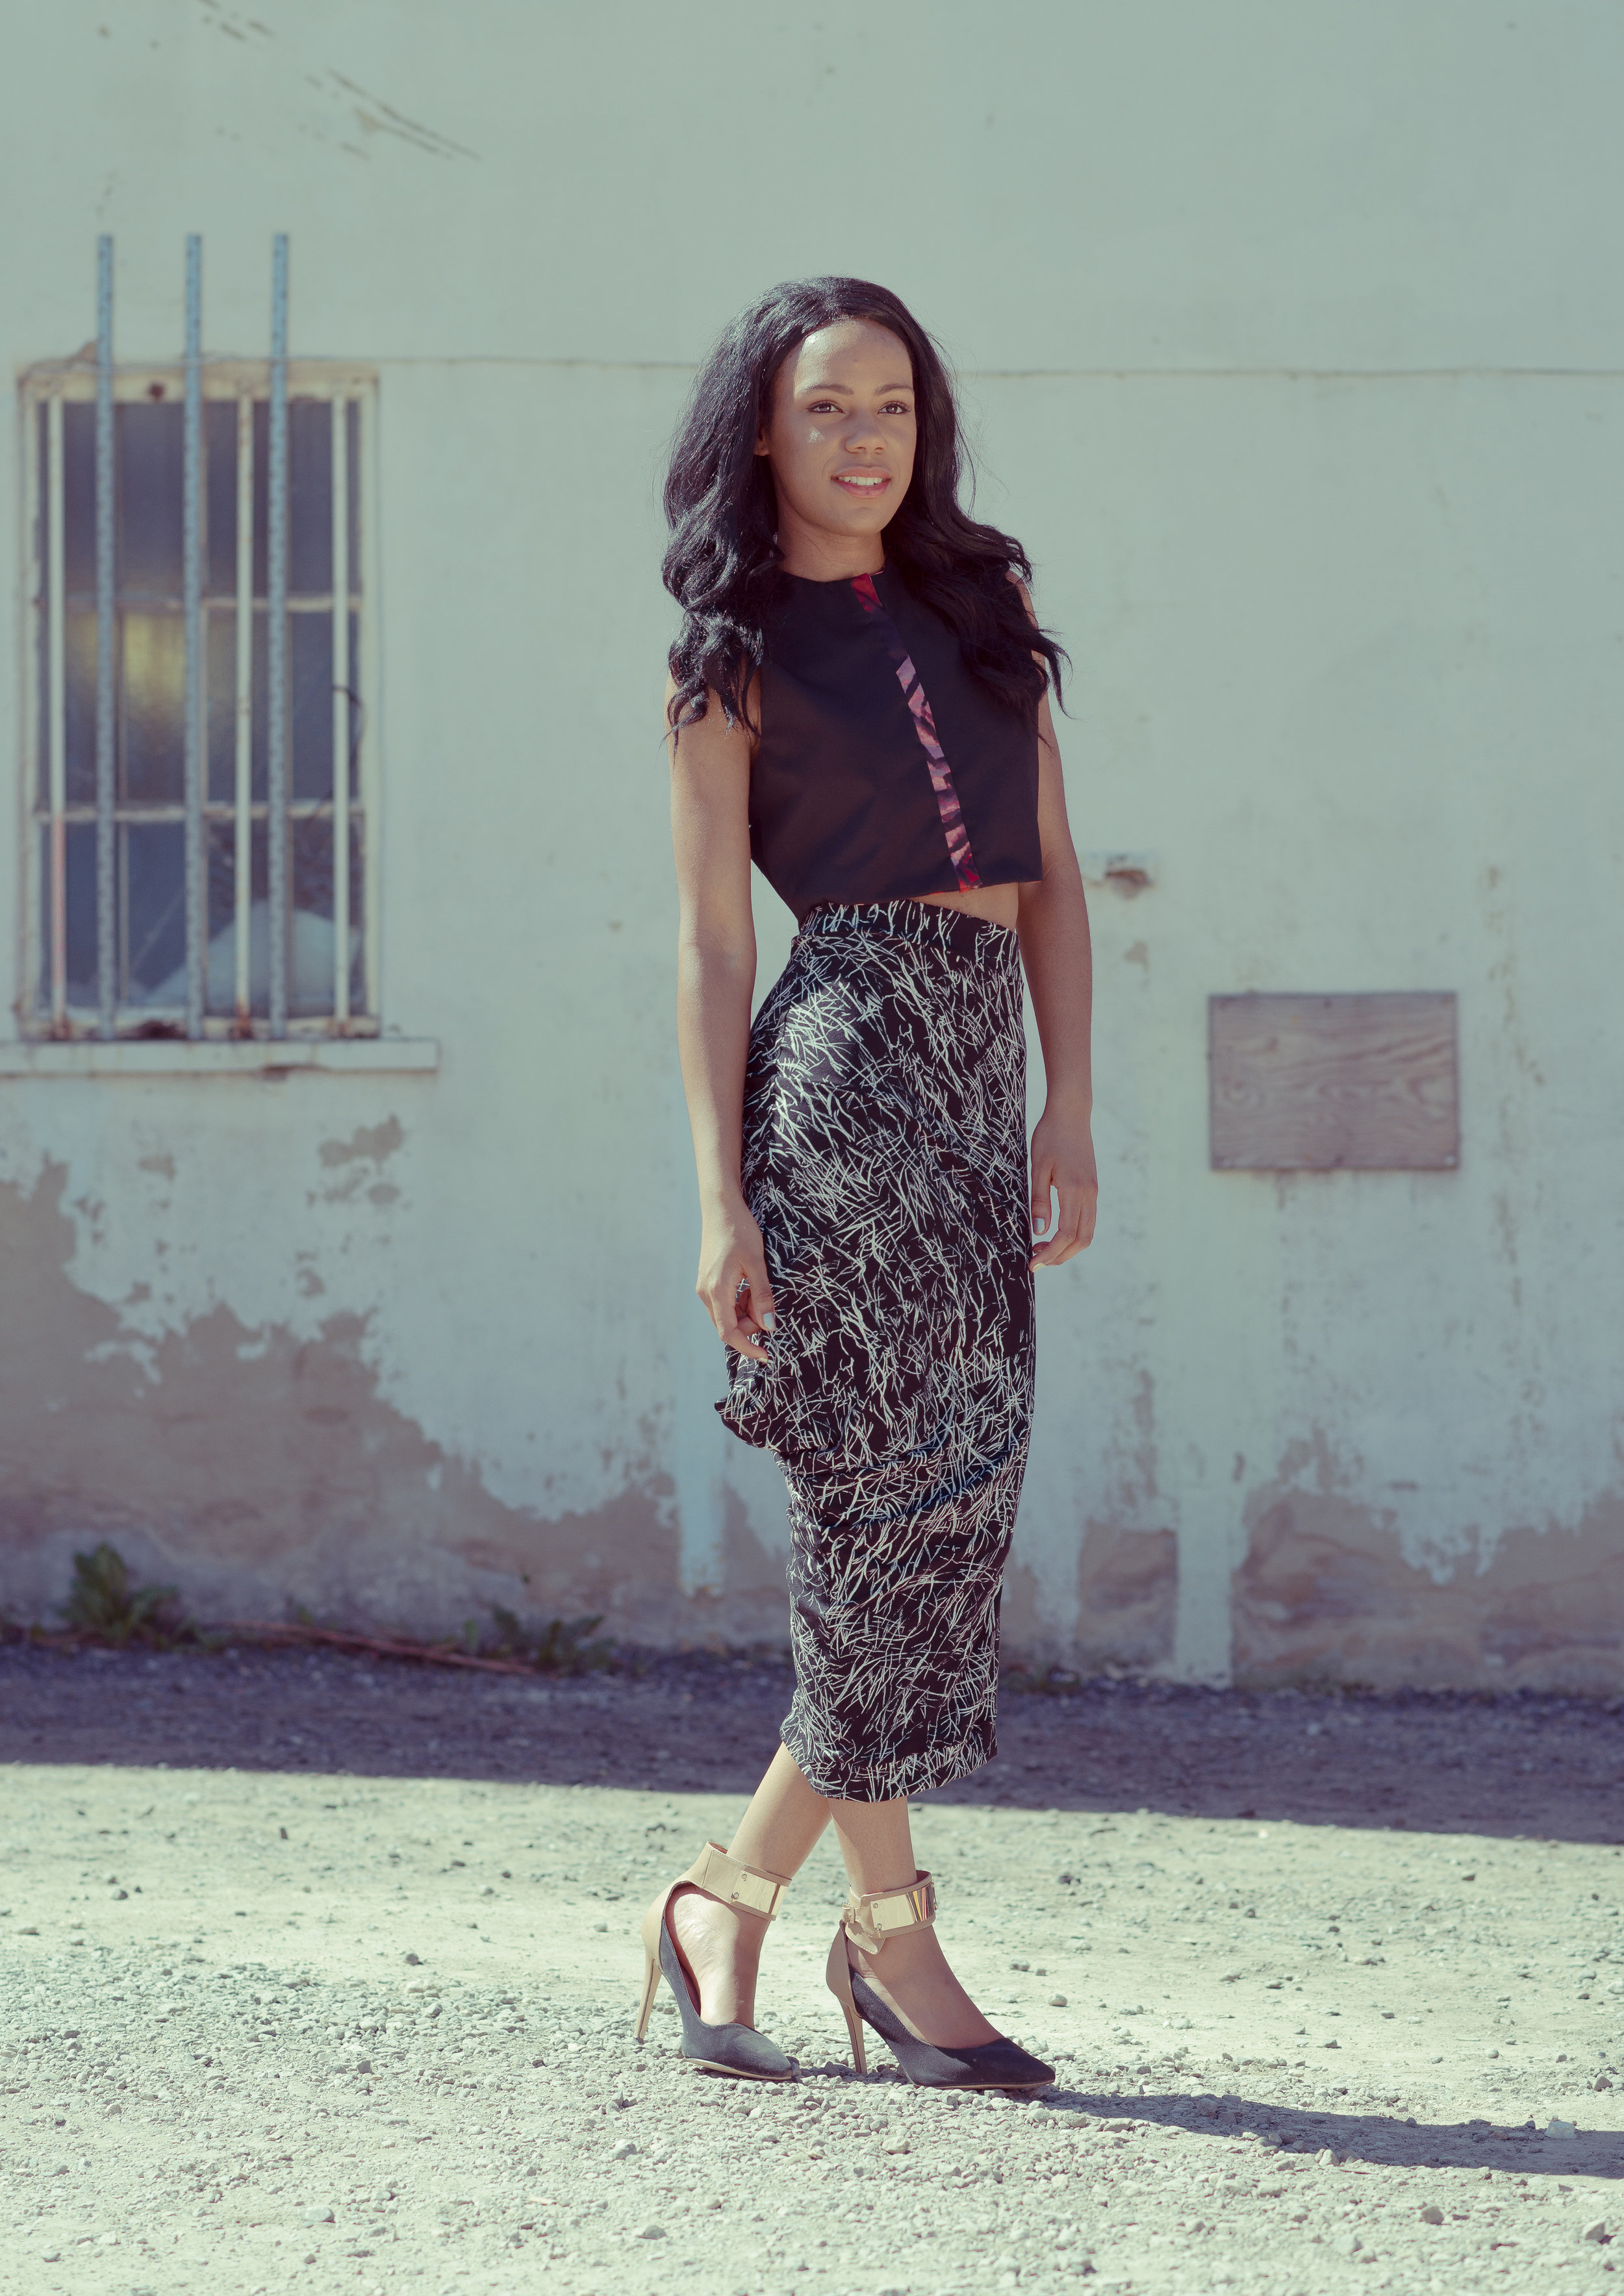 zaramia-ava-zaramiaava-leeds-fashion-designer-ethical-sustainable-tailored-minimalist-crop-top-black-print-point-skirt-black-jacket-belt-versatile-drape-cowl-styling-womenswear-models-13